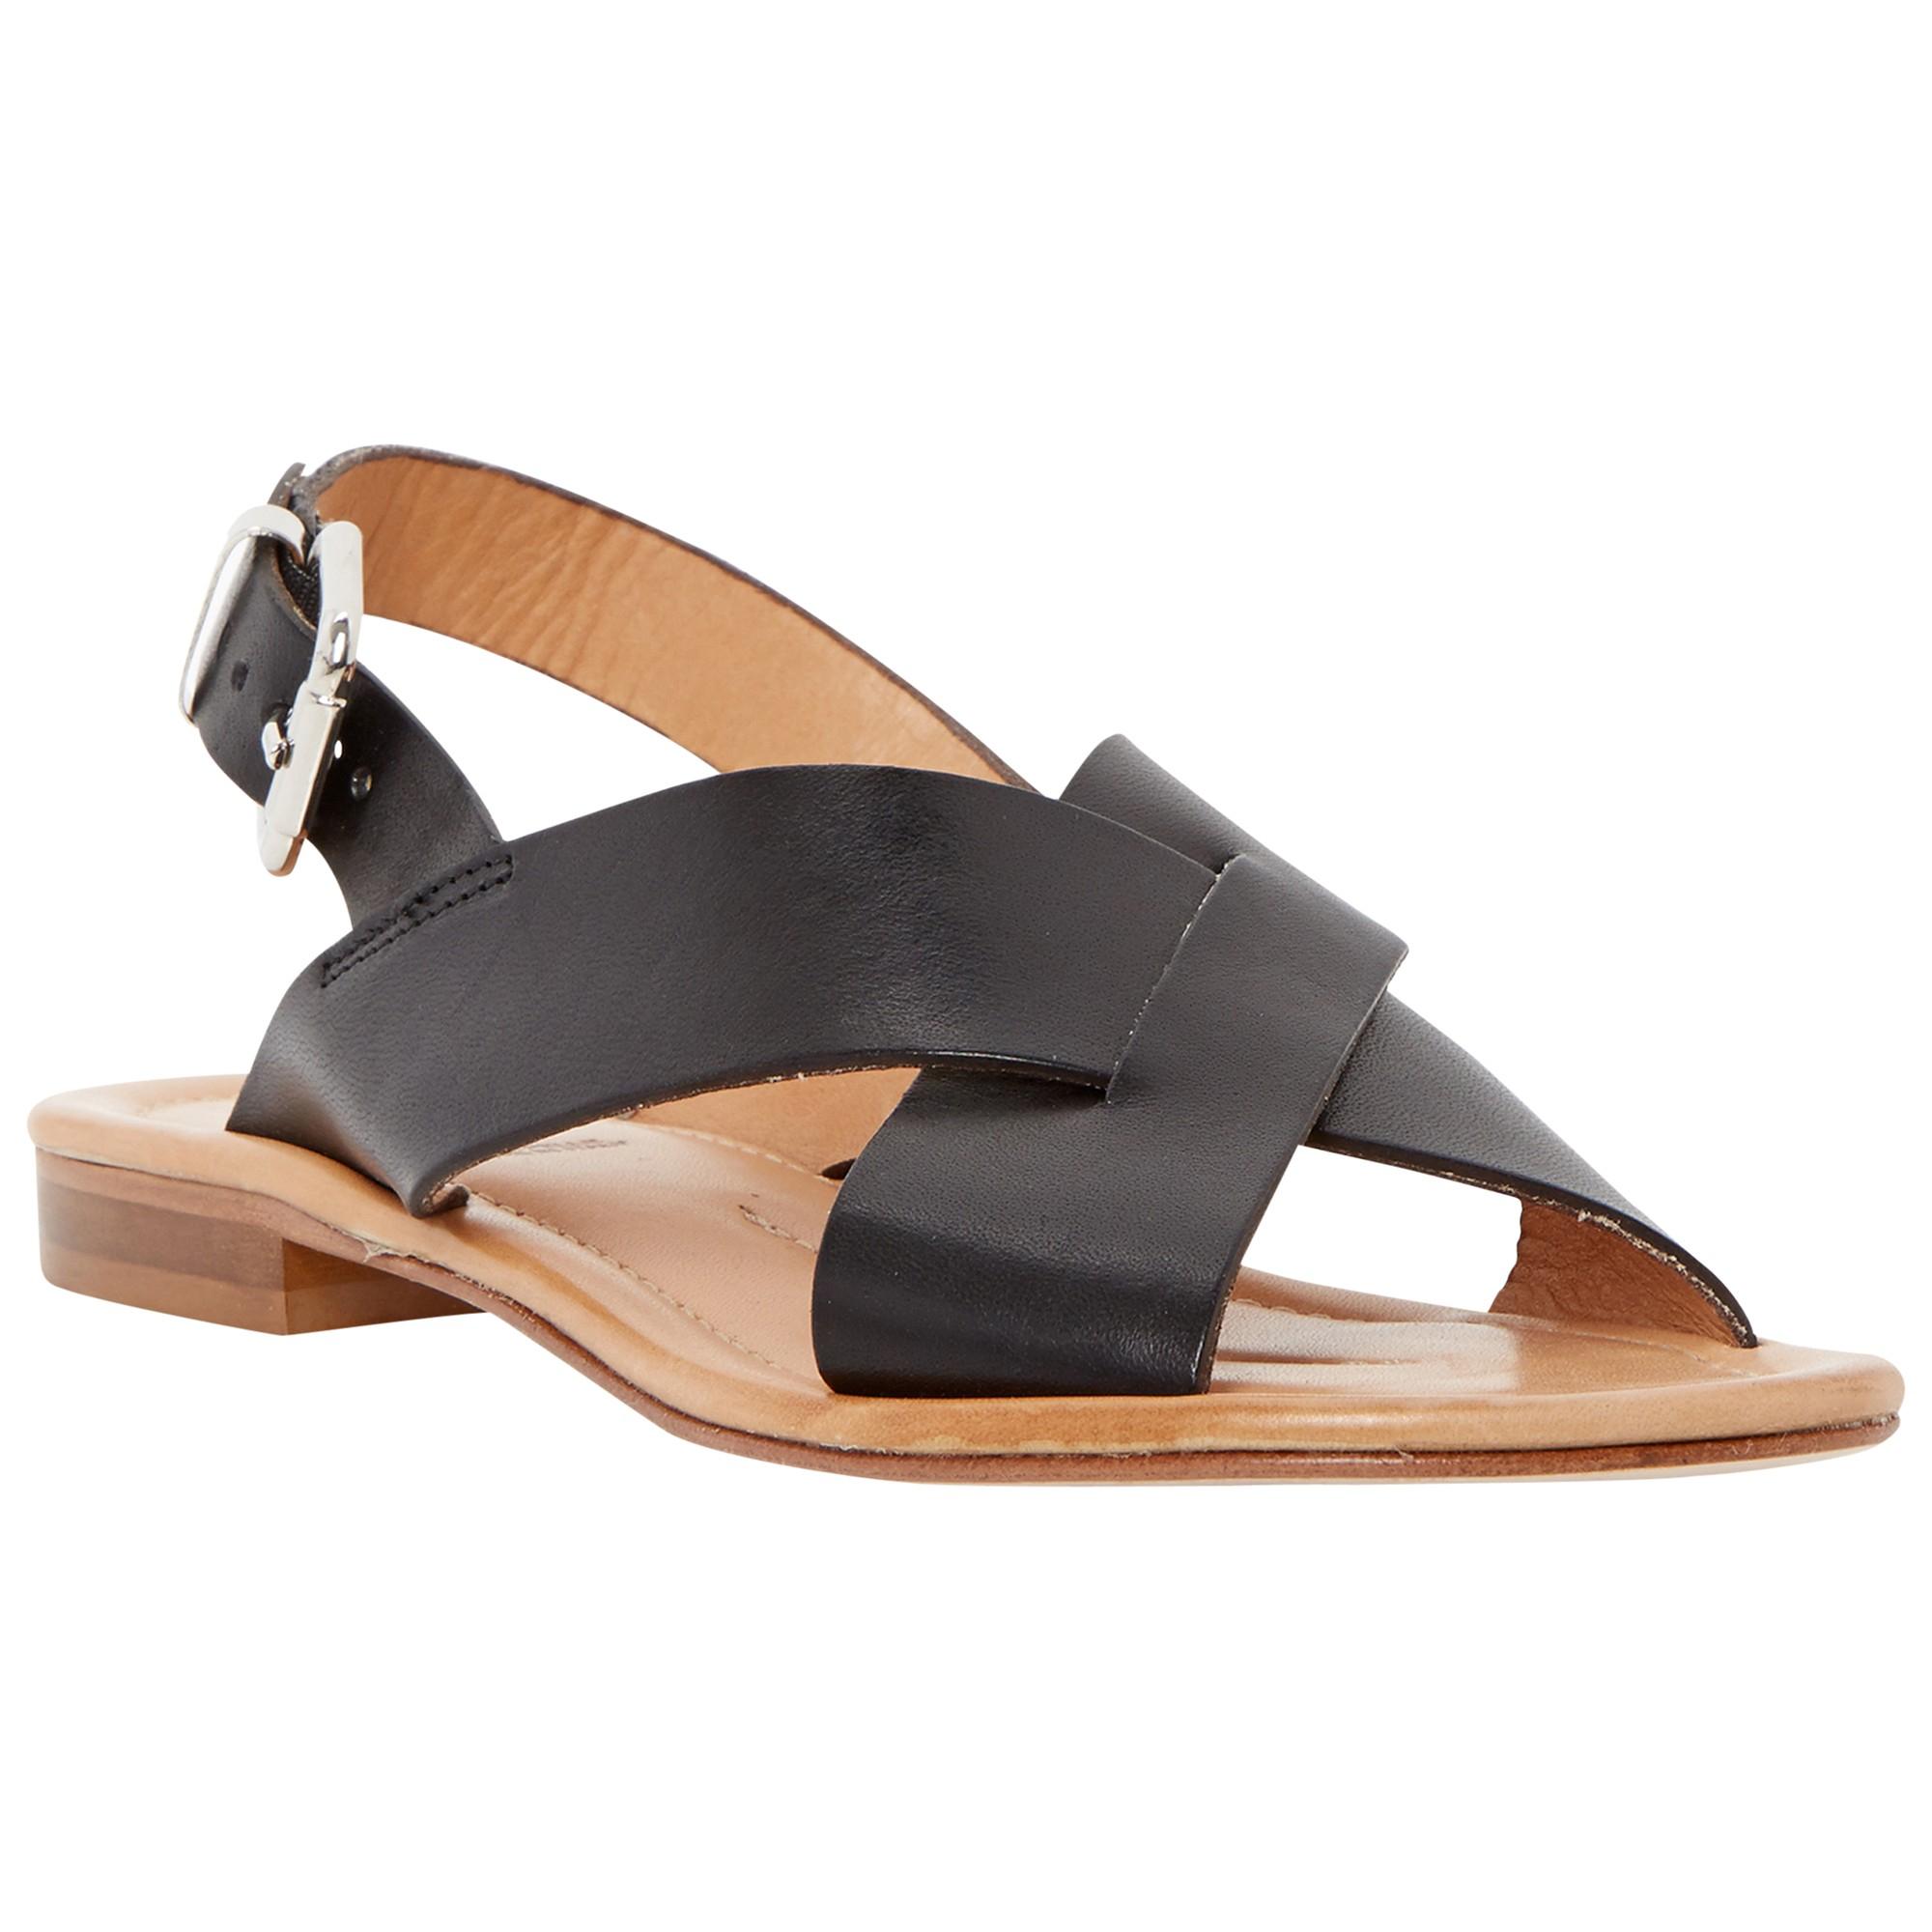 d294a8ce886a Dune Black Lois Flat Cross Strap Sandals in Black - Lyst